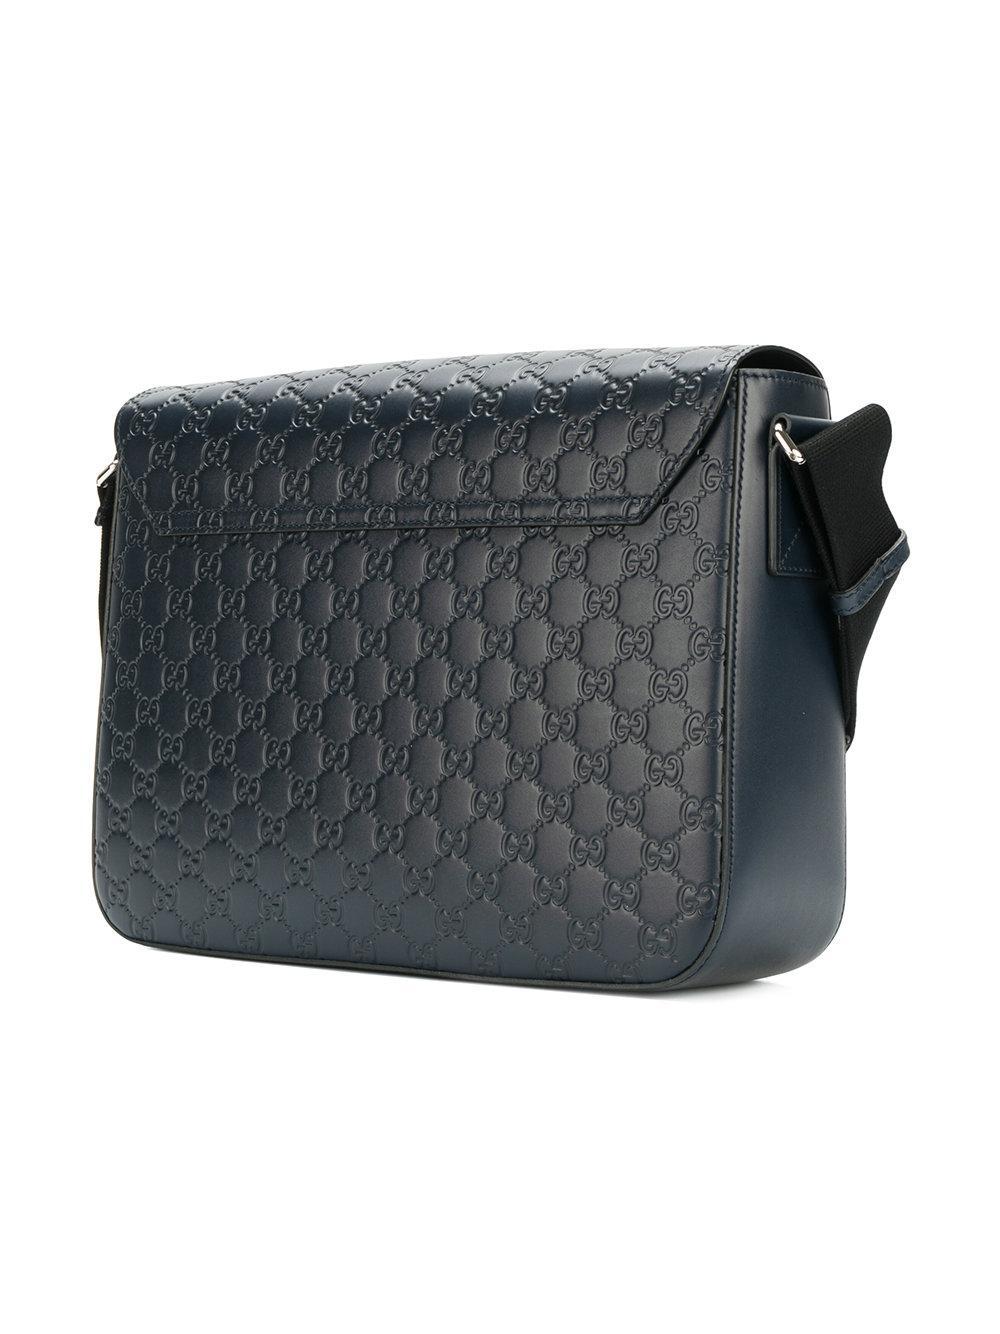 016cff802b2 Gucci Signature Messenger Bag in Blue for Men - Lyst